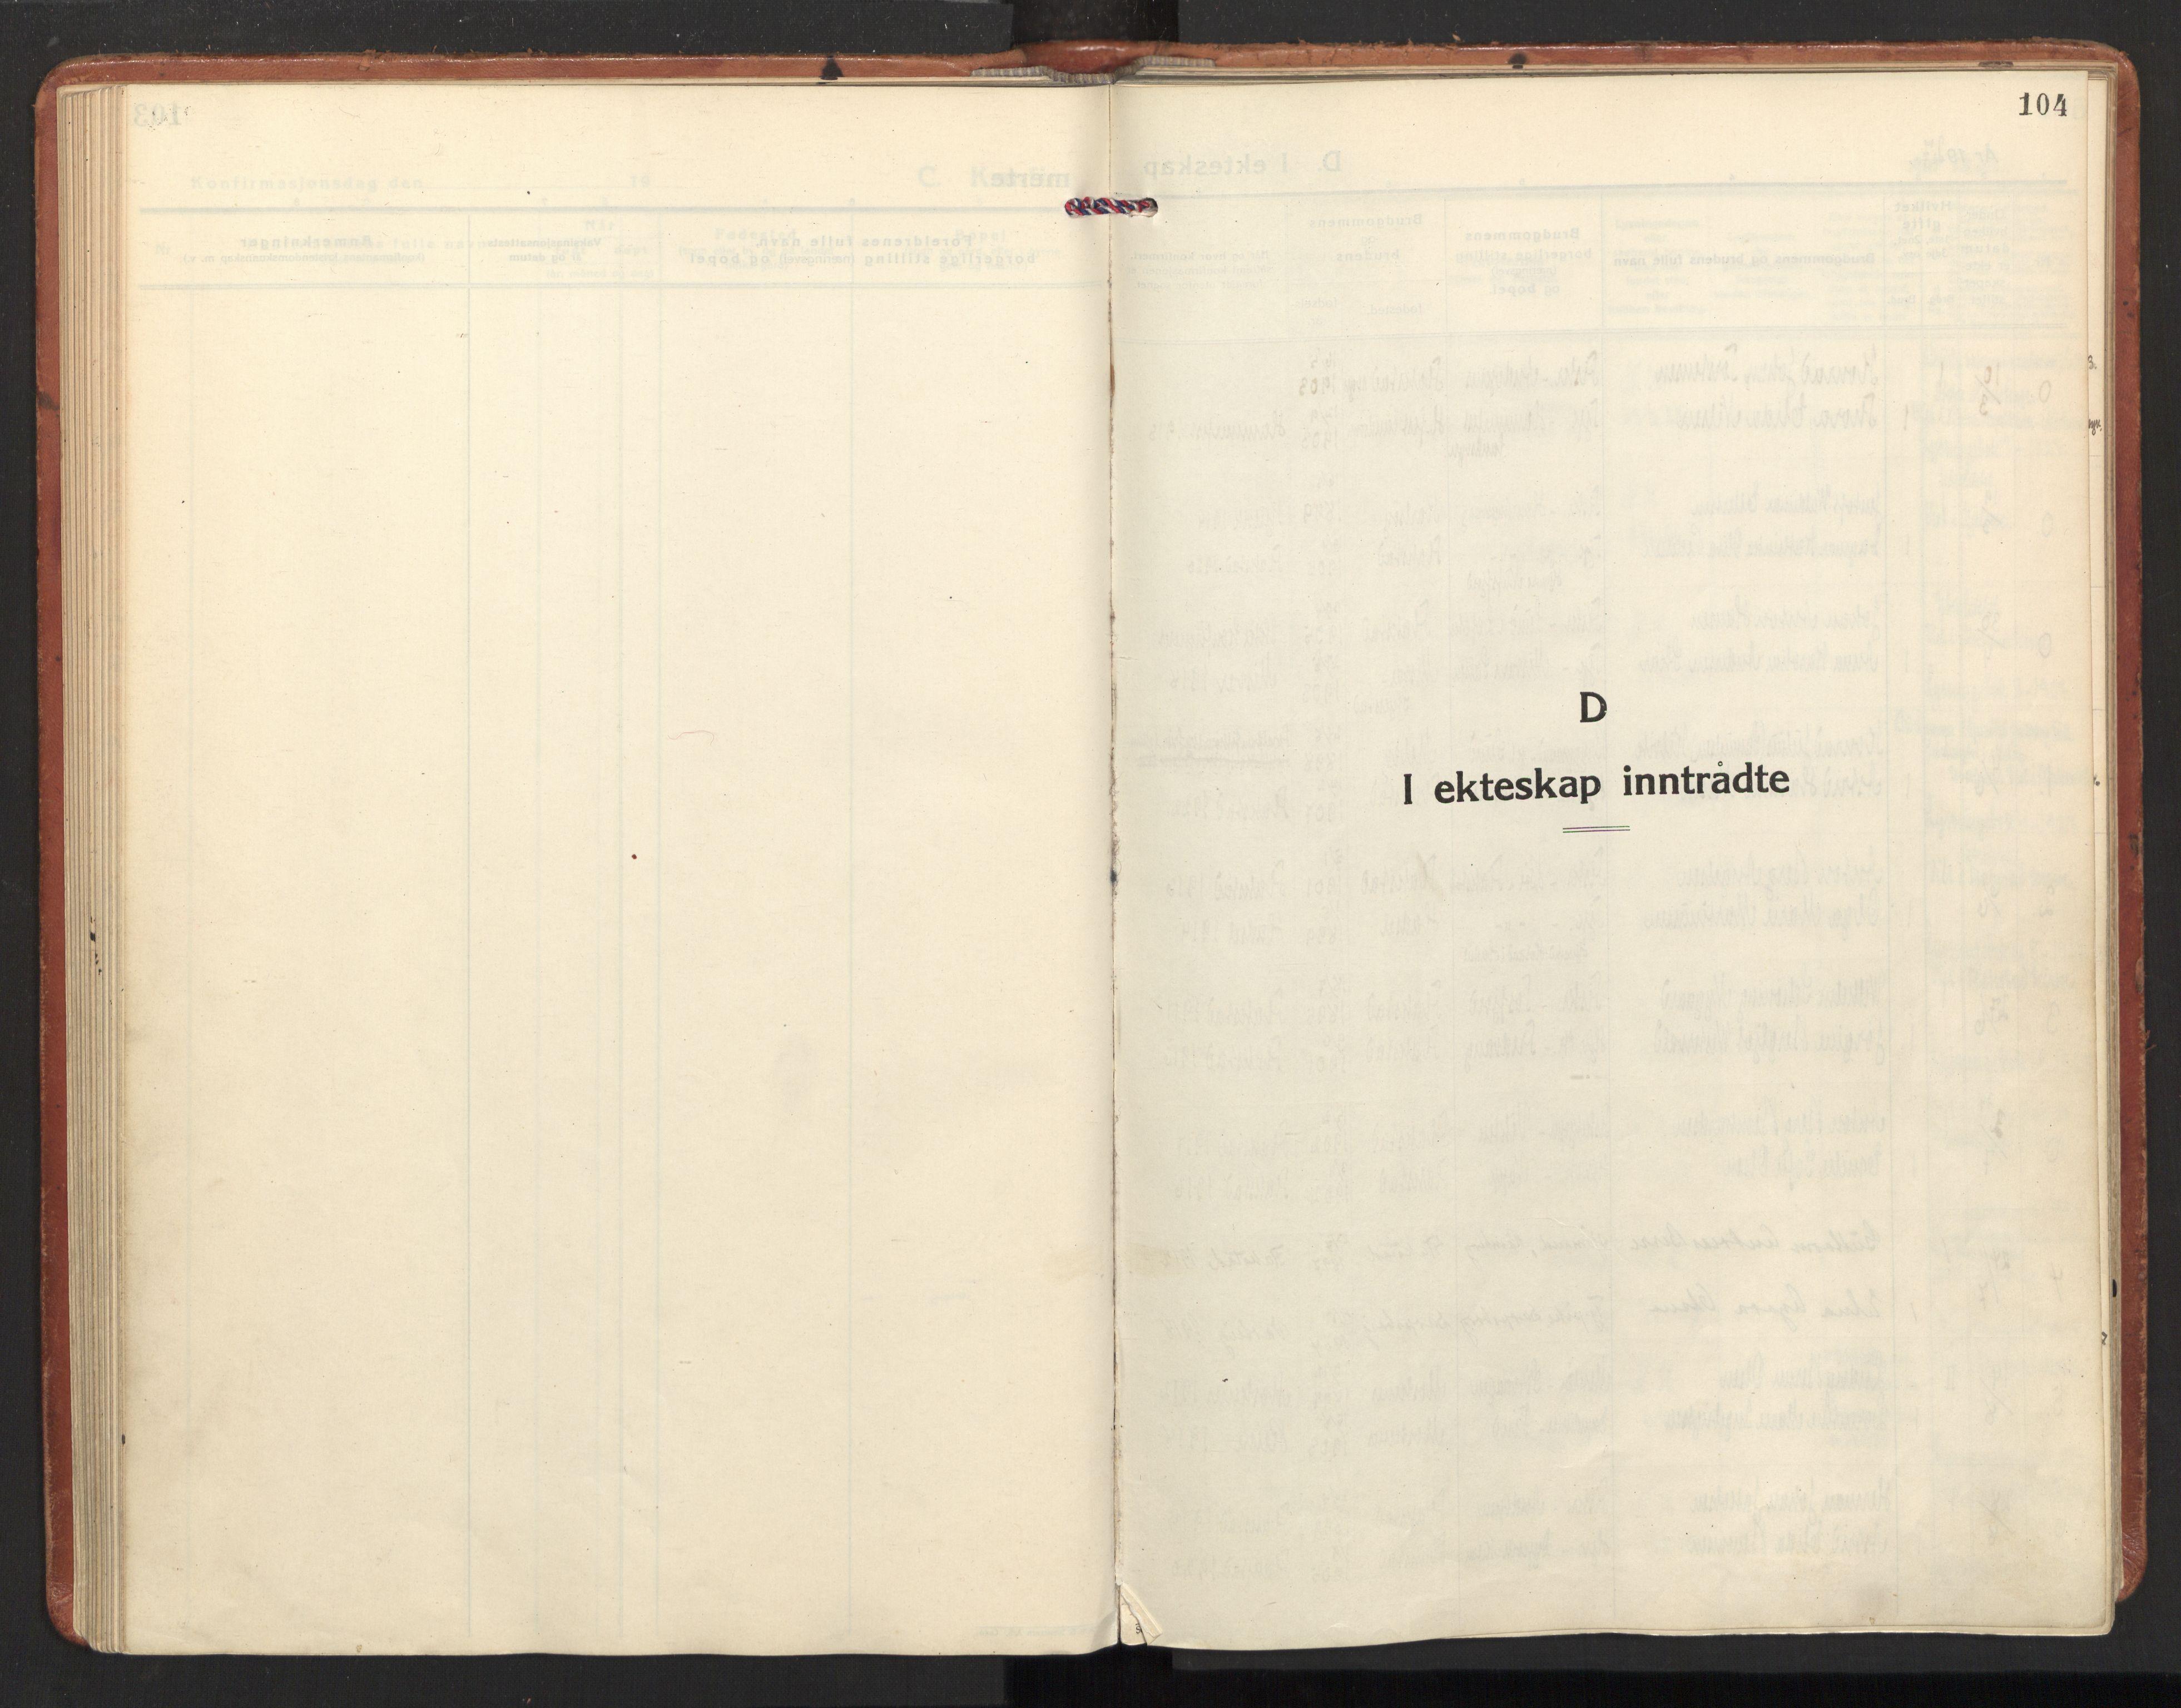 SAT, Ministerialprotokoller, klokkerbøker og fødselsregistre - Nordland, 885/L1211: Ministerialbok nr. 885A11, 1927-1938, s. 104